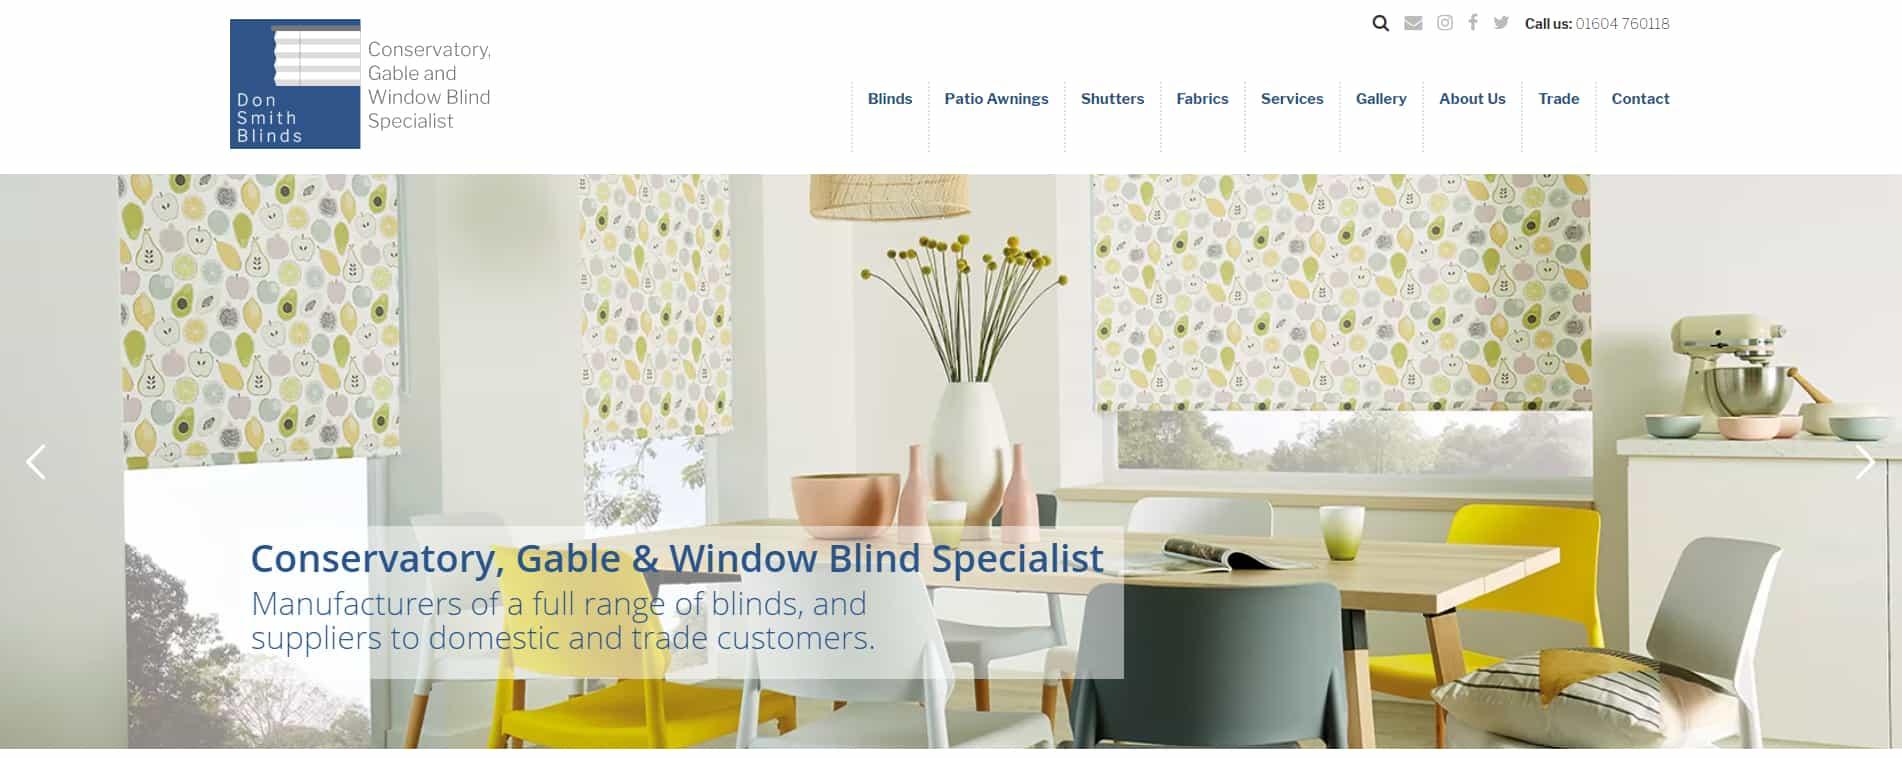 Don Smith Blinds Ltd